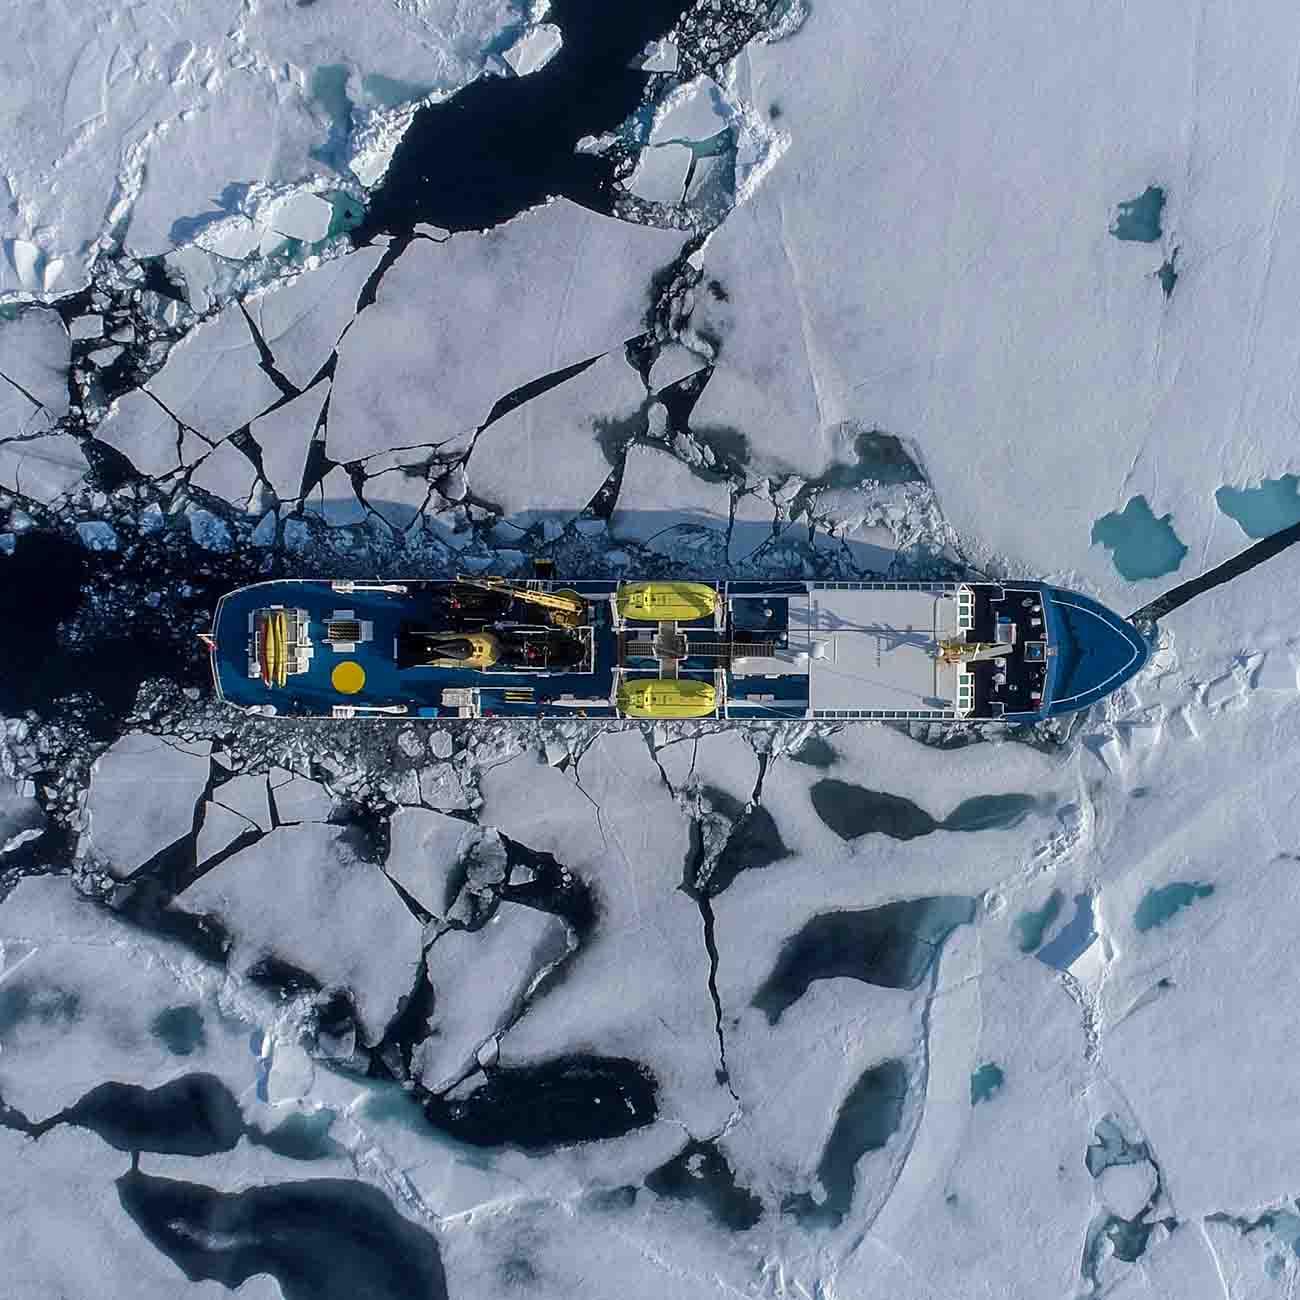 Ocean Nova au coeur de la Banquise Arctique - Grands Espaces